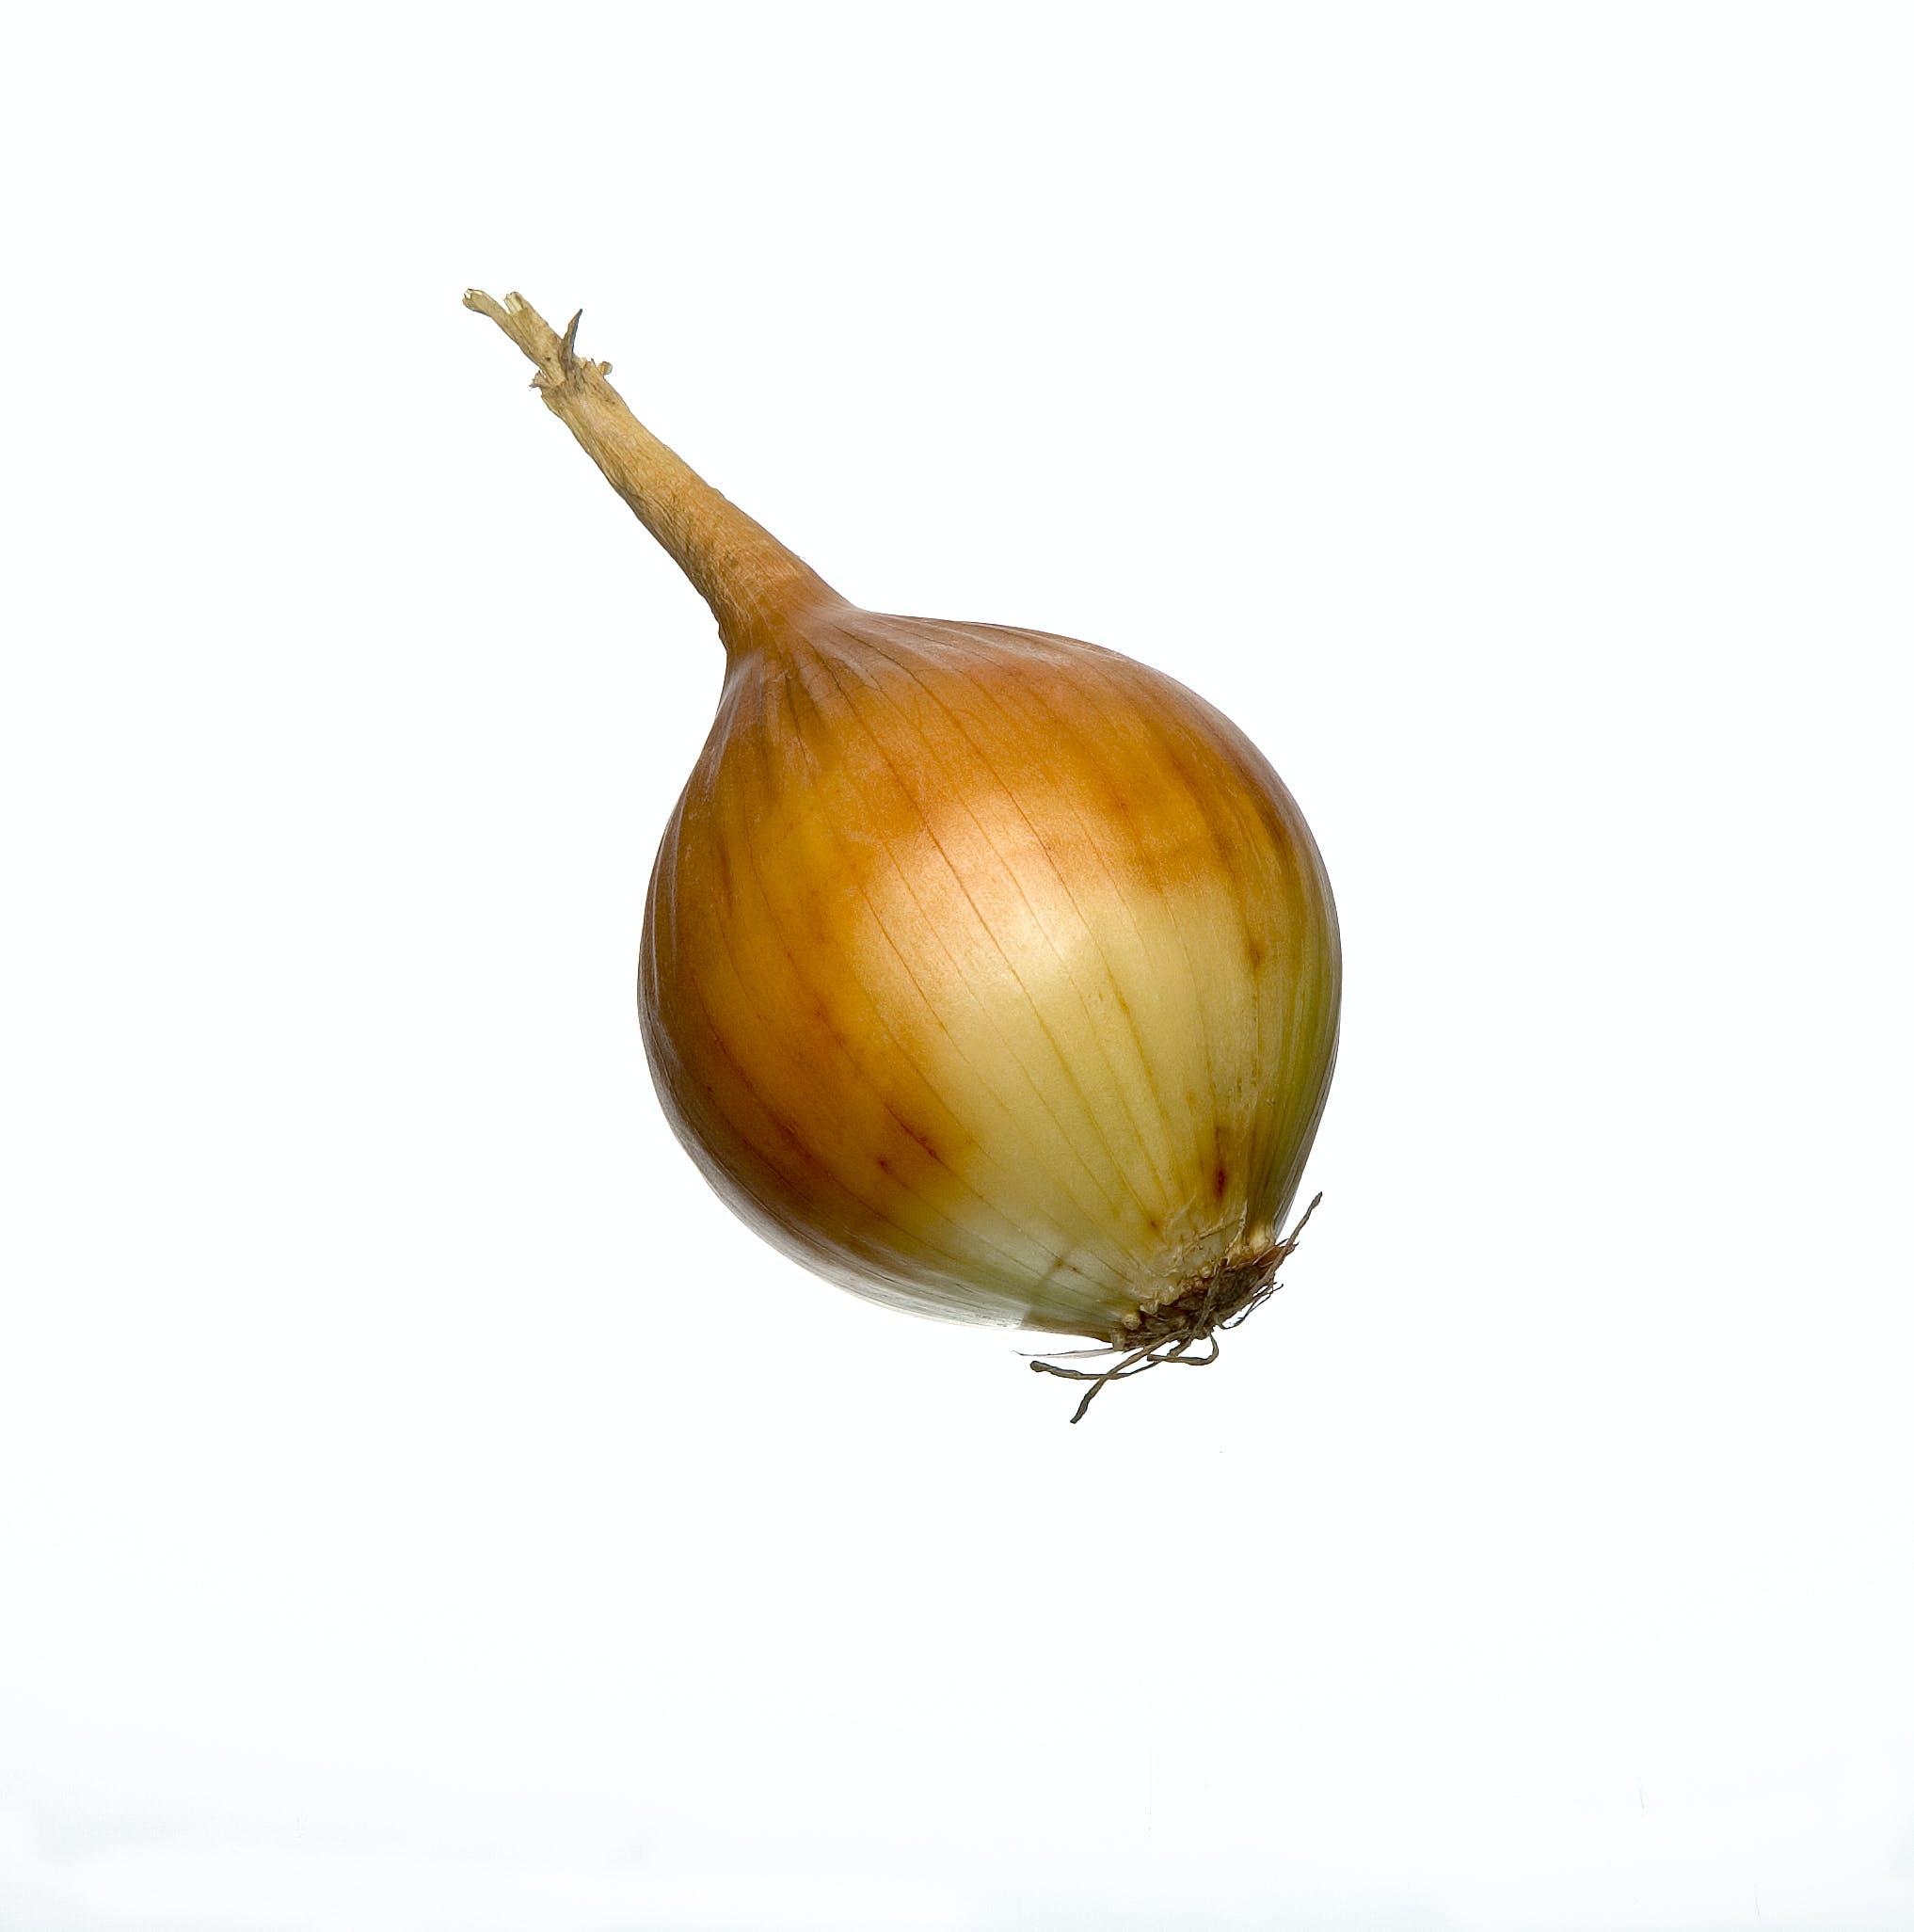 Free stock photo of onion